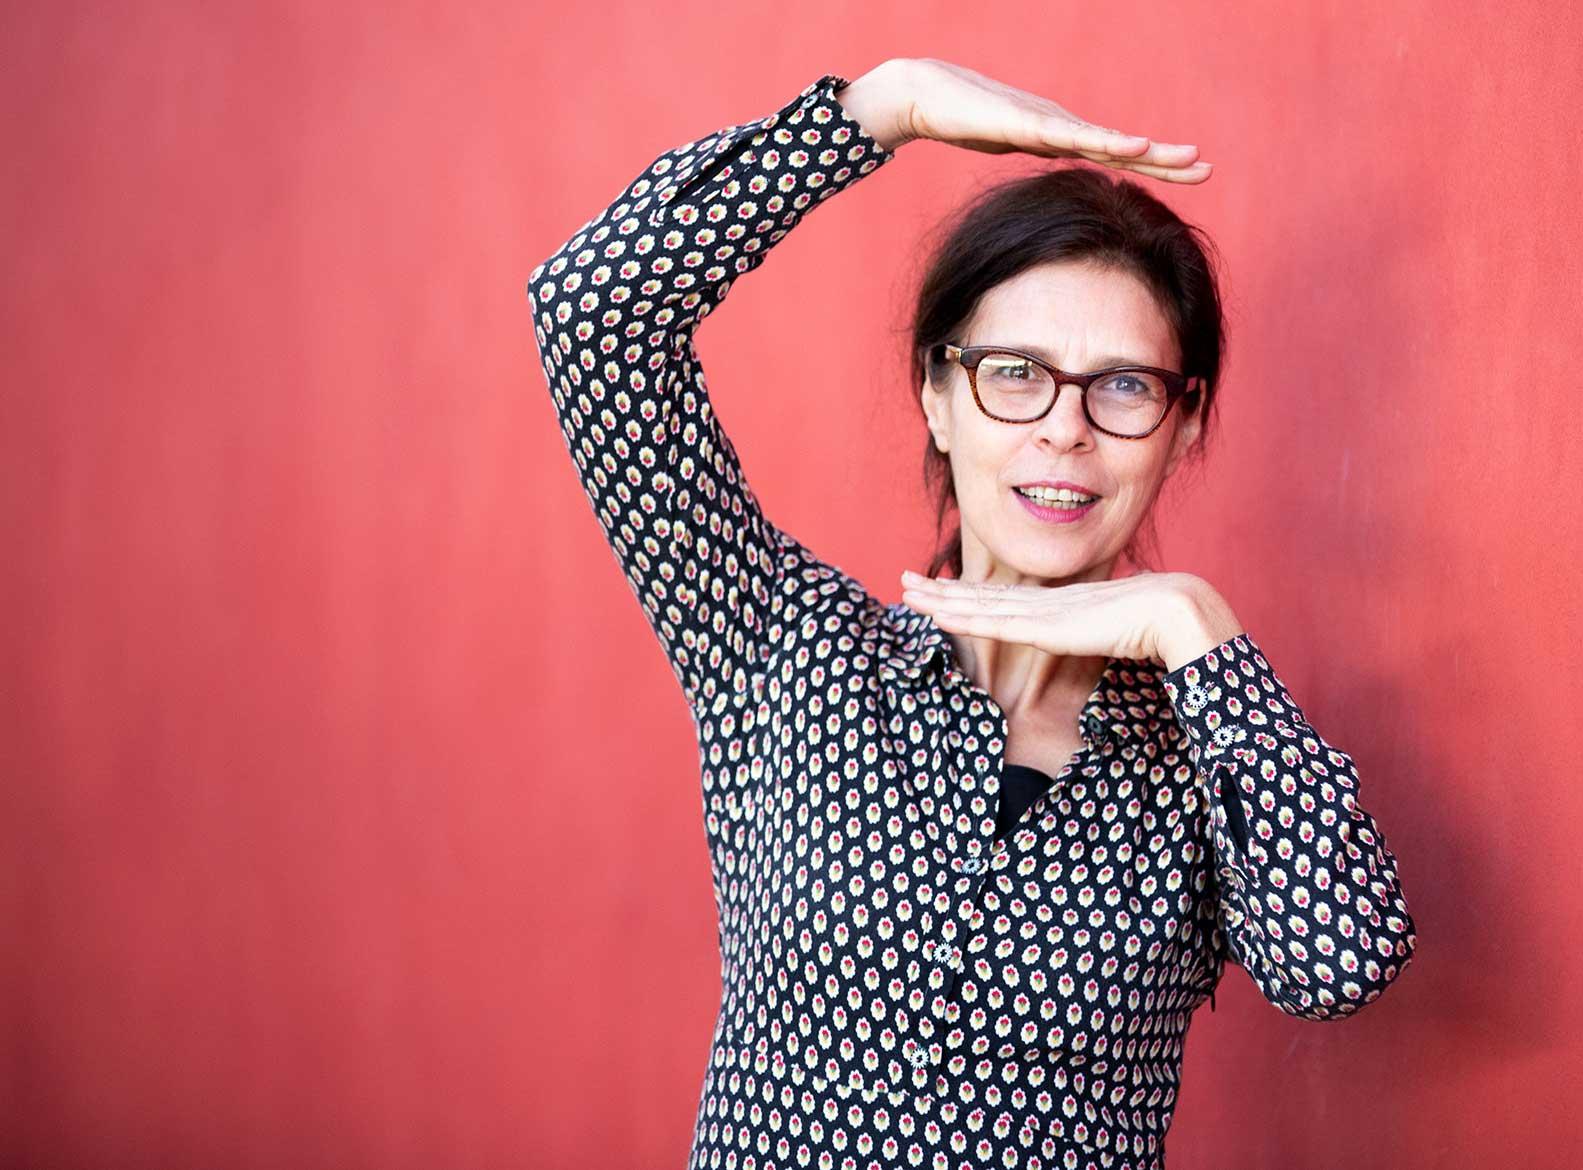 Marie Herbreteau